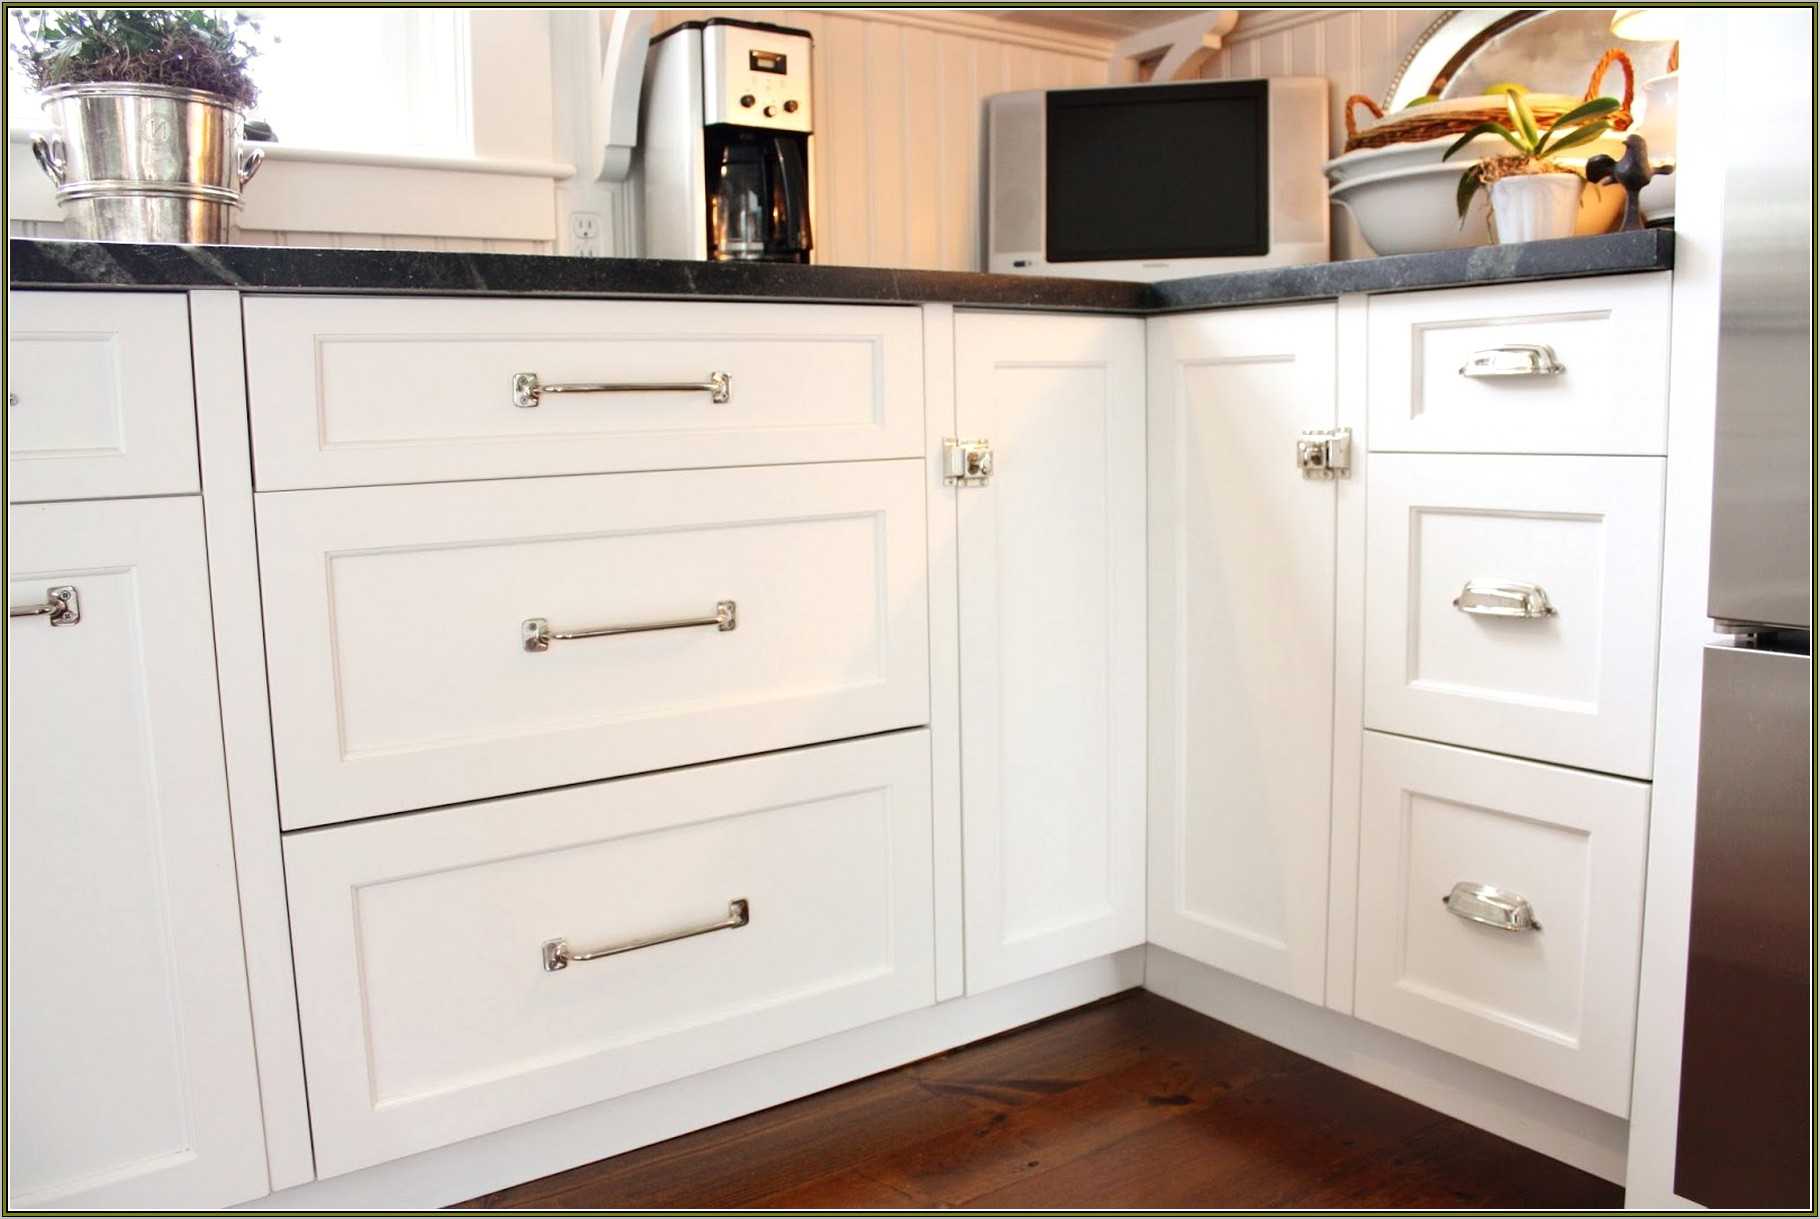 Decorative Kitchen Knobs And Handles